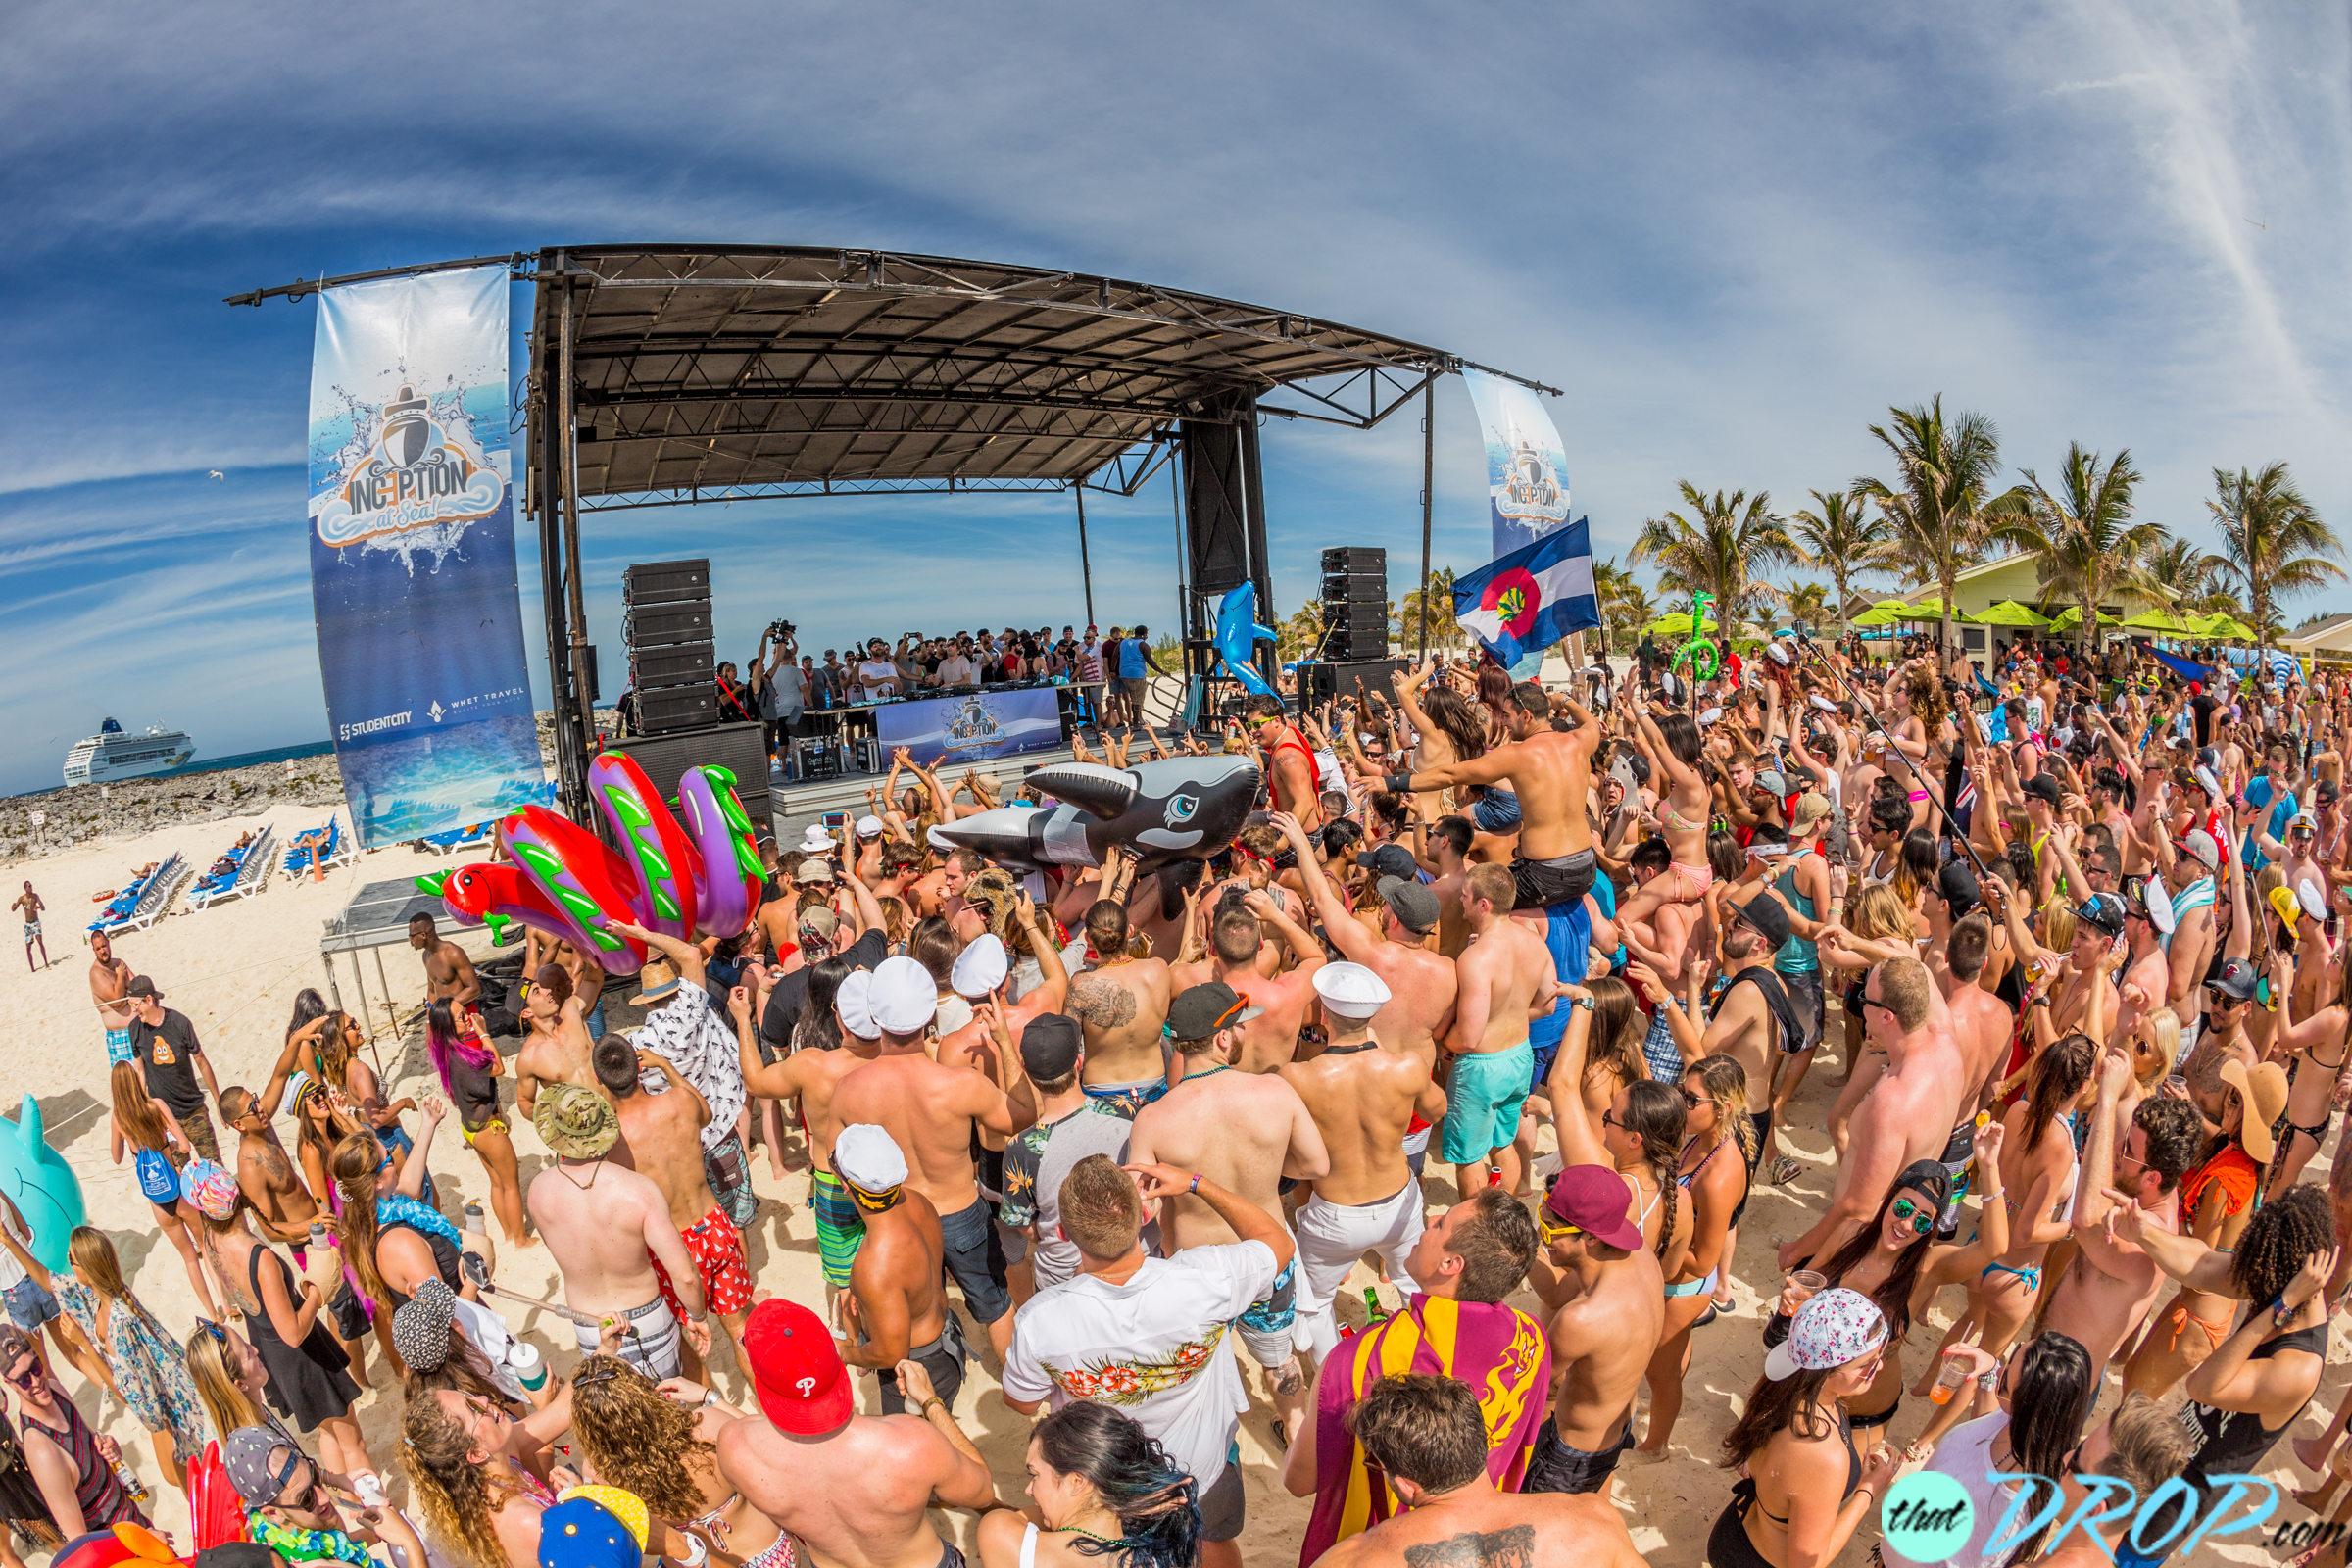 Bahamas Party in FULL SWING